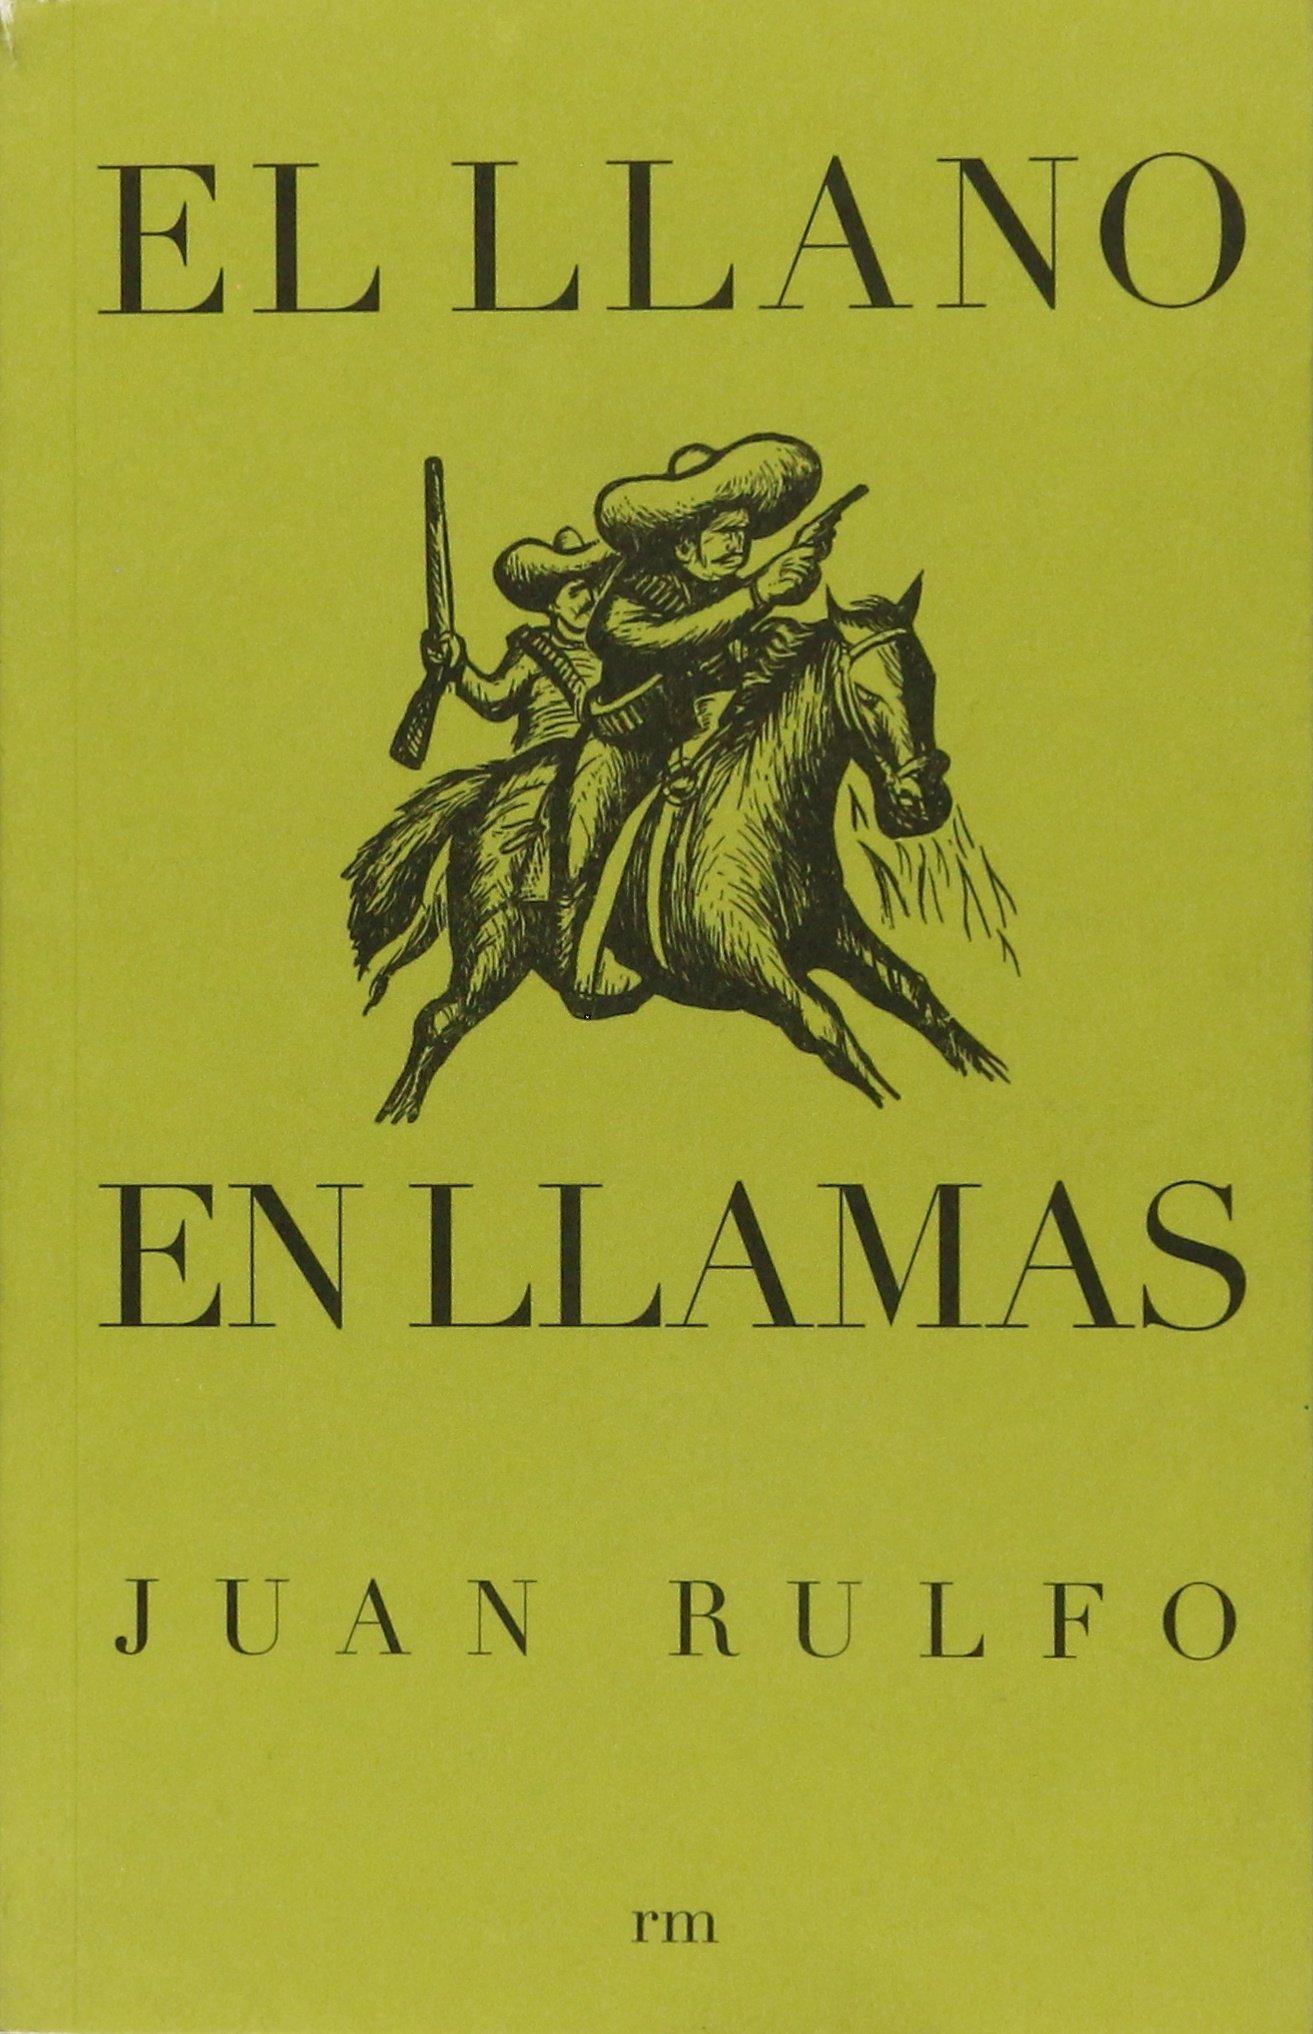 El llano en llamas: Rulfo Juan: Amazon.com.mx: Libros